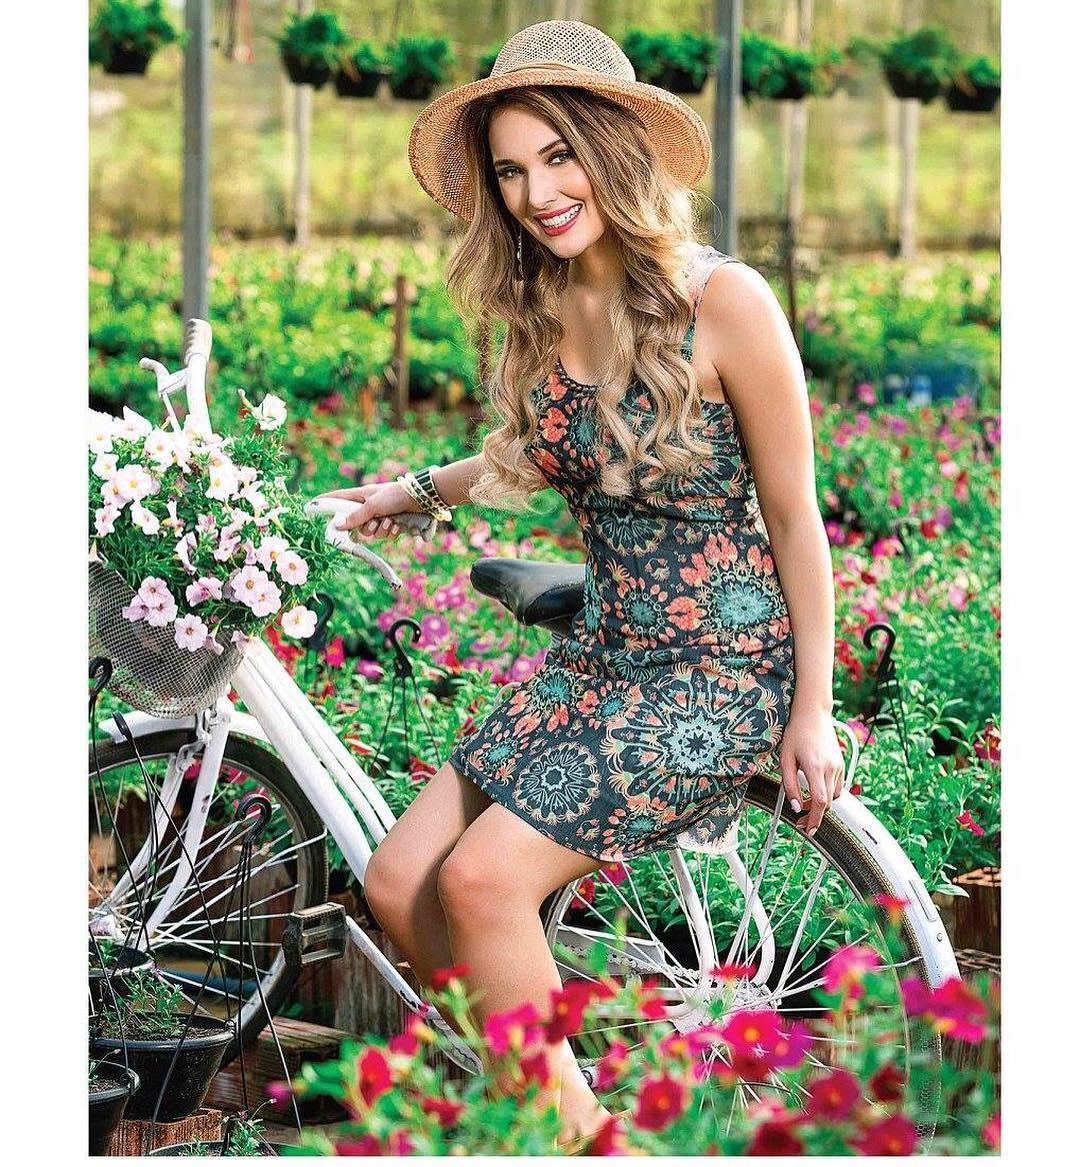 katherin strickert, miss megaverse 2018, 1st runner-up de supermodel international 2017. - Página 3 Culbkwmo